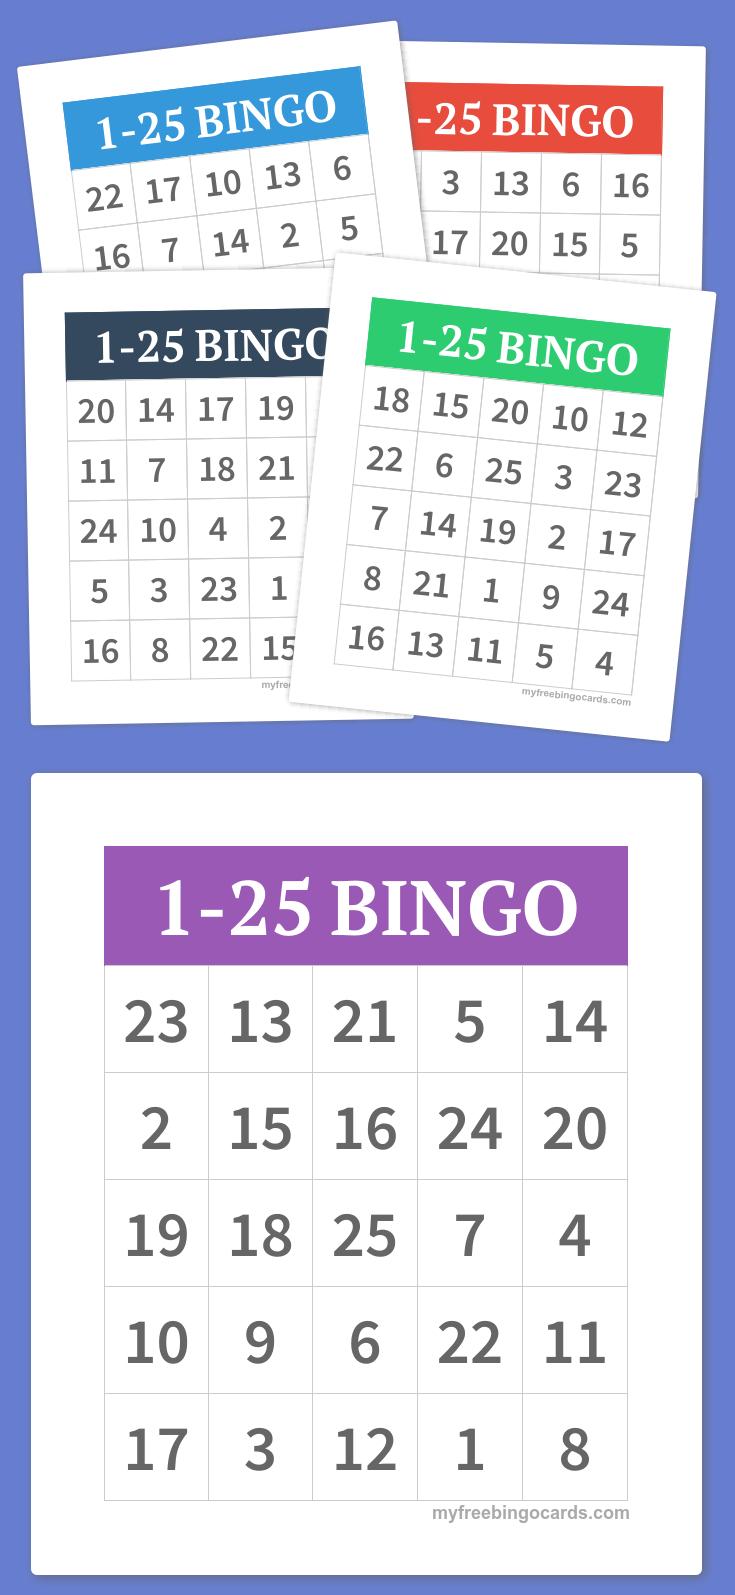 1-25 Bingo   Bingo Cards Printable, Free Printable Bingo